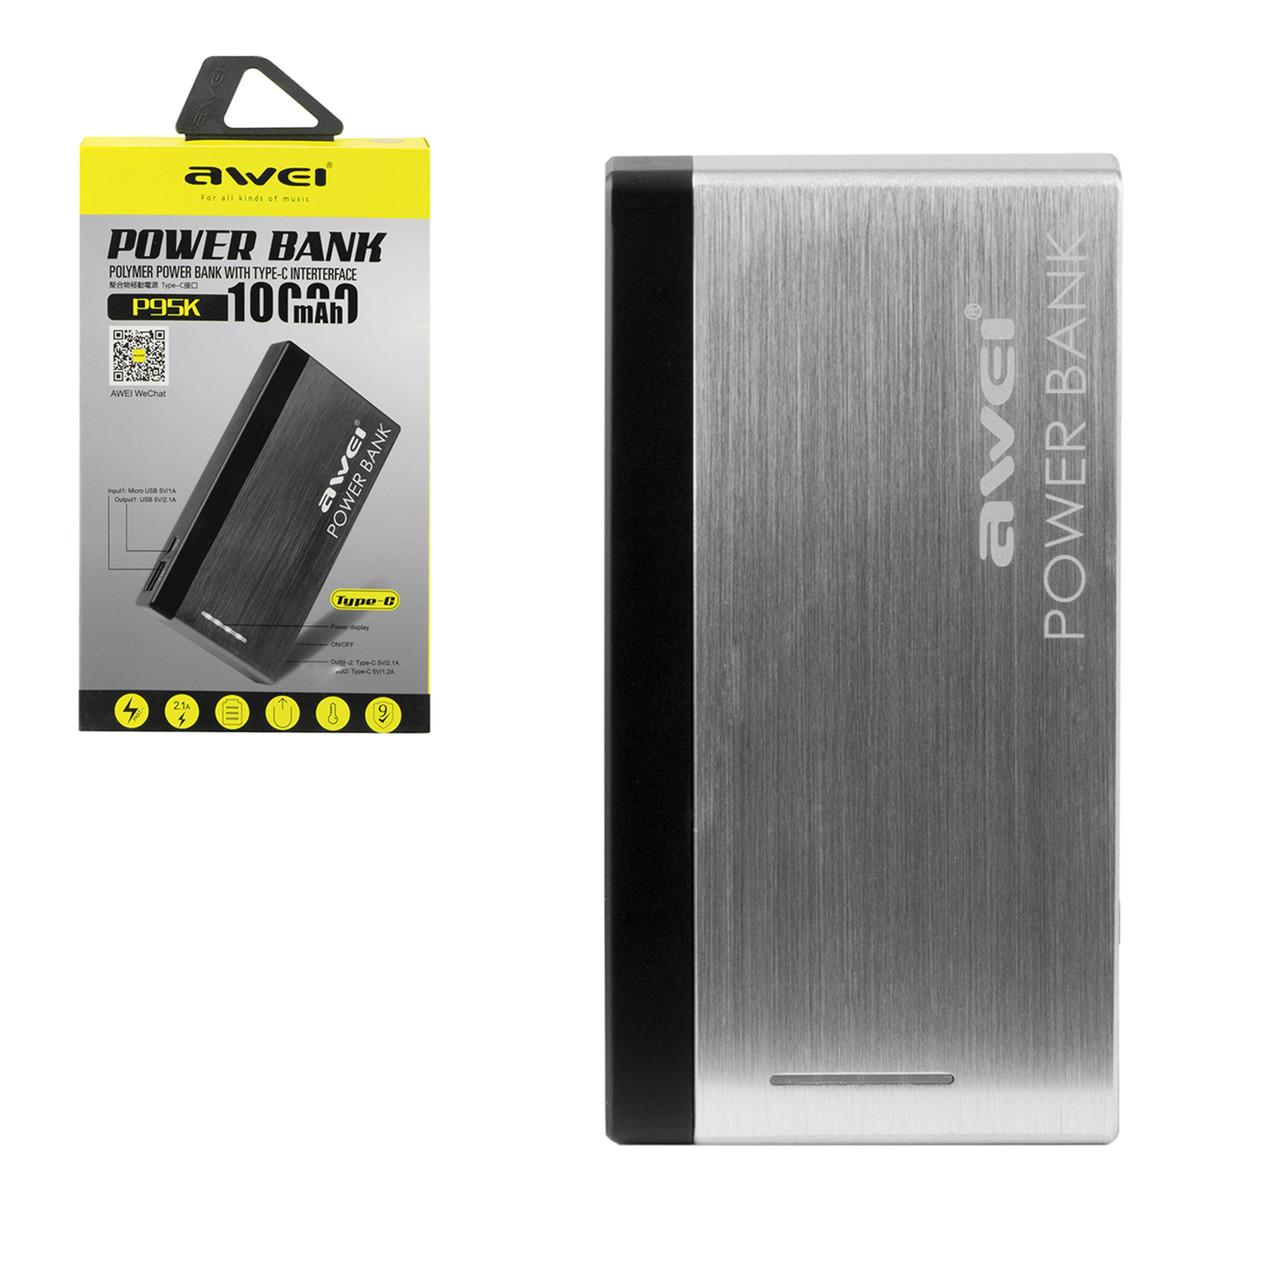 Power bank Awei P95K 10000 mAh 1XUSB 2.1A Gold/Black